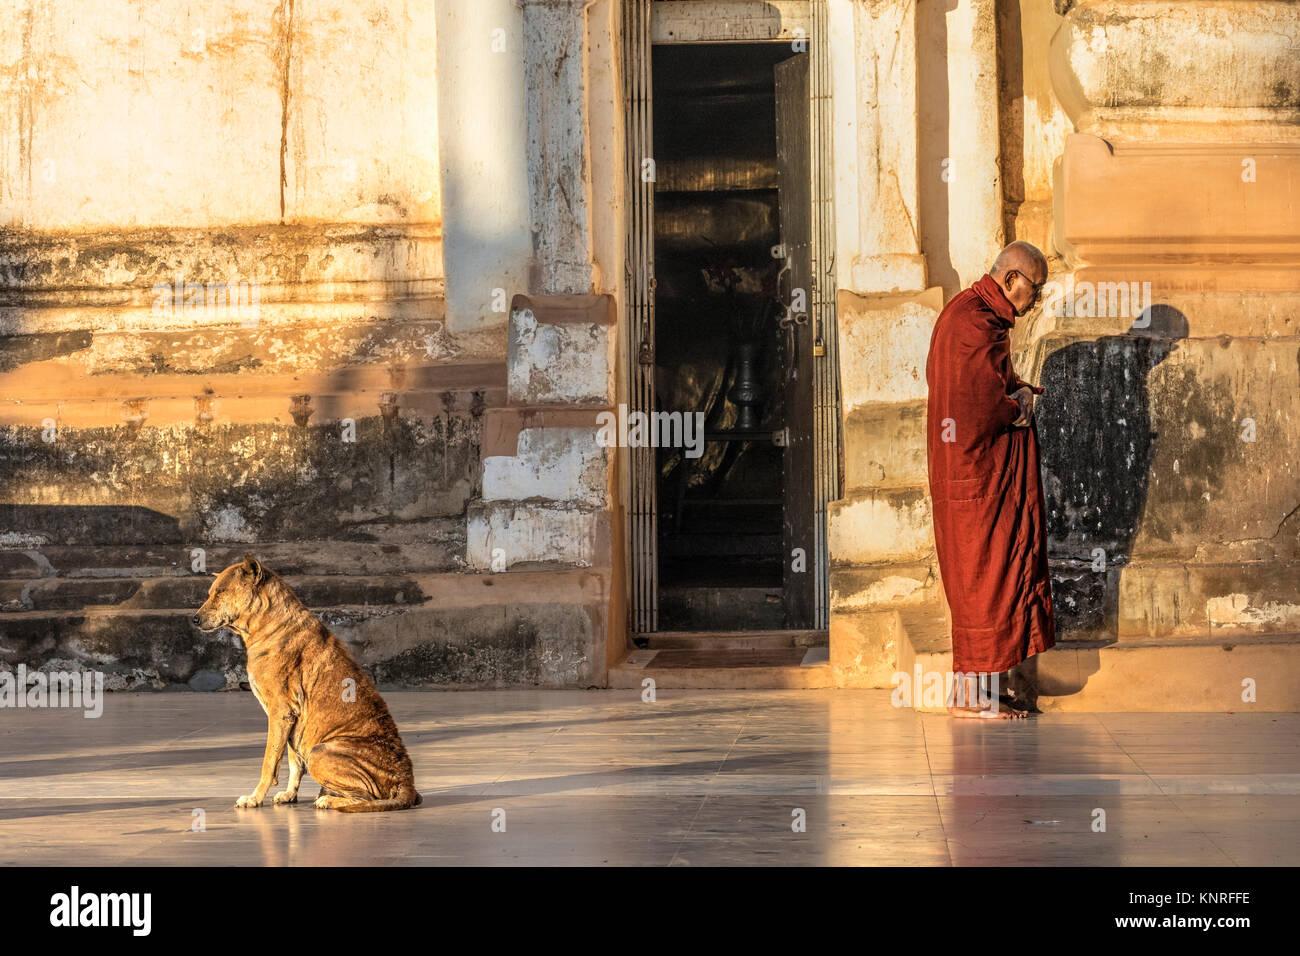 monks waiting for food in Myin Ka Bar, Bagan, Myanmar, Asia - Stock Image